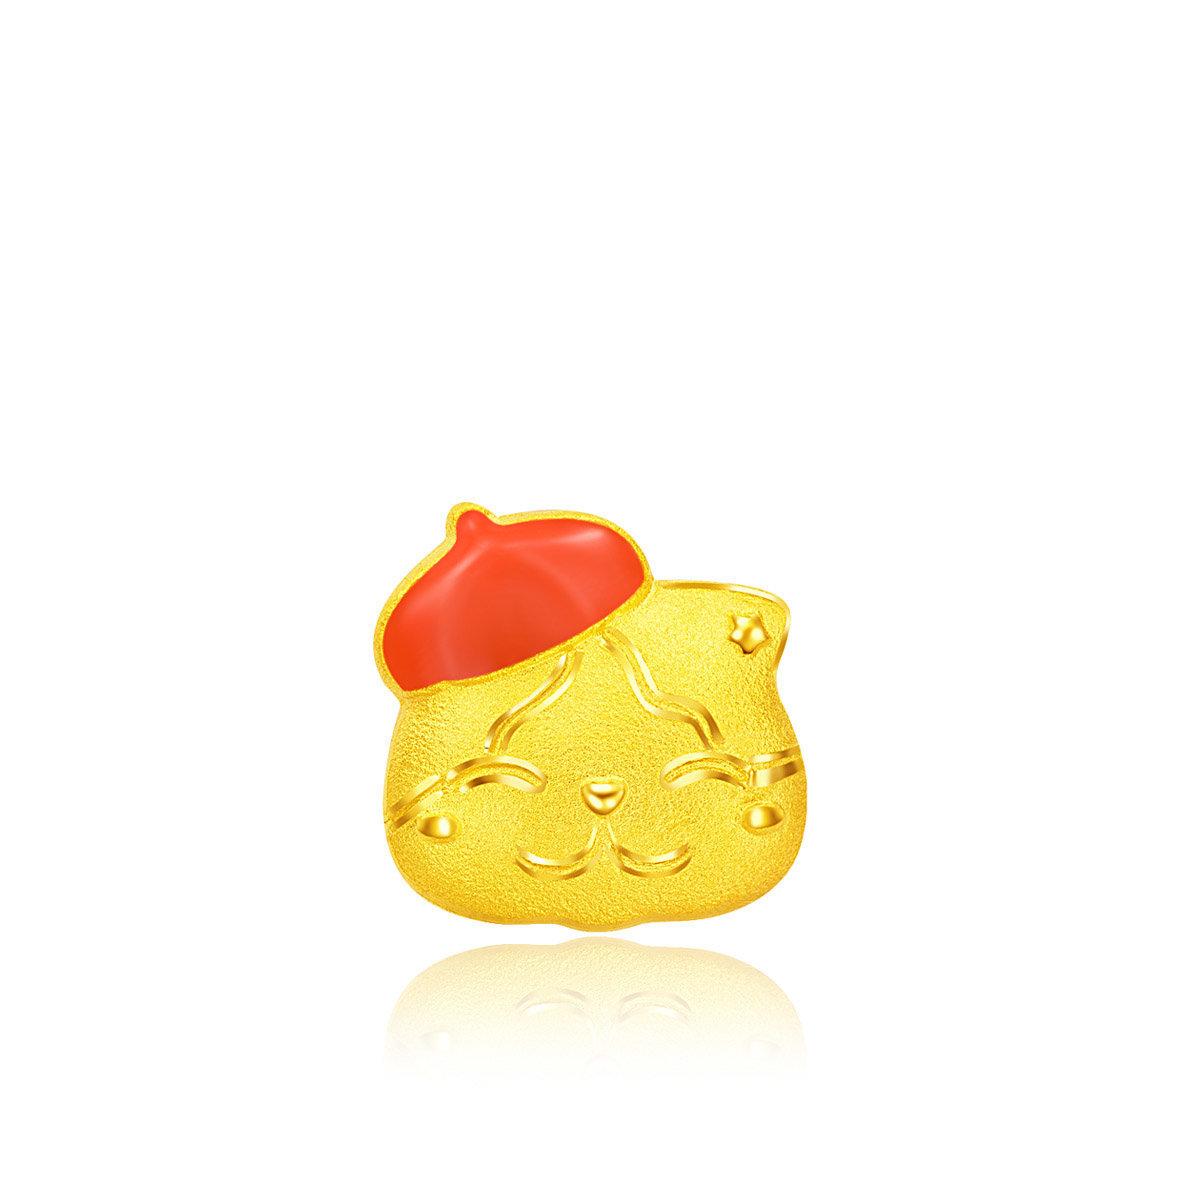 Ah Meow 999.9 Gold Earring (Single)